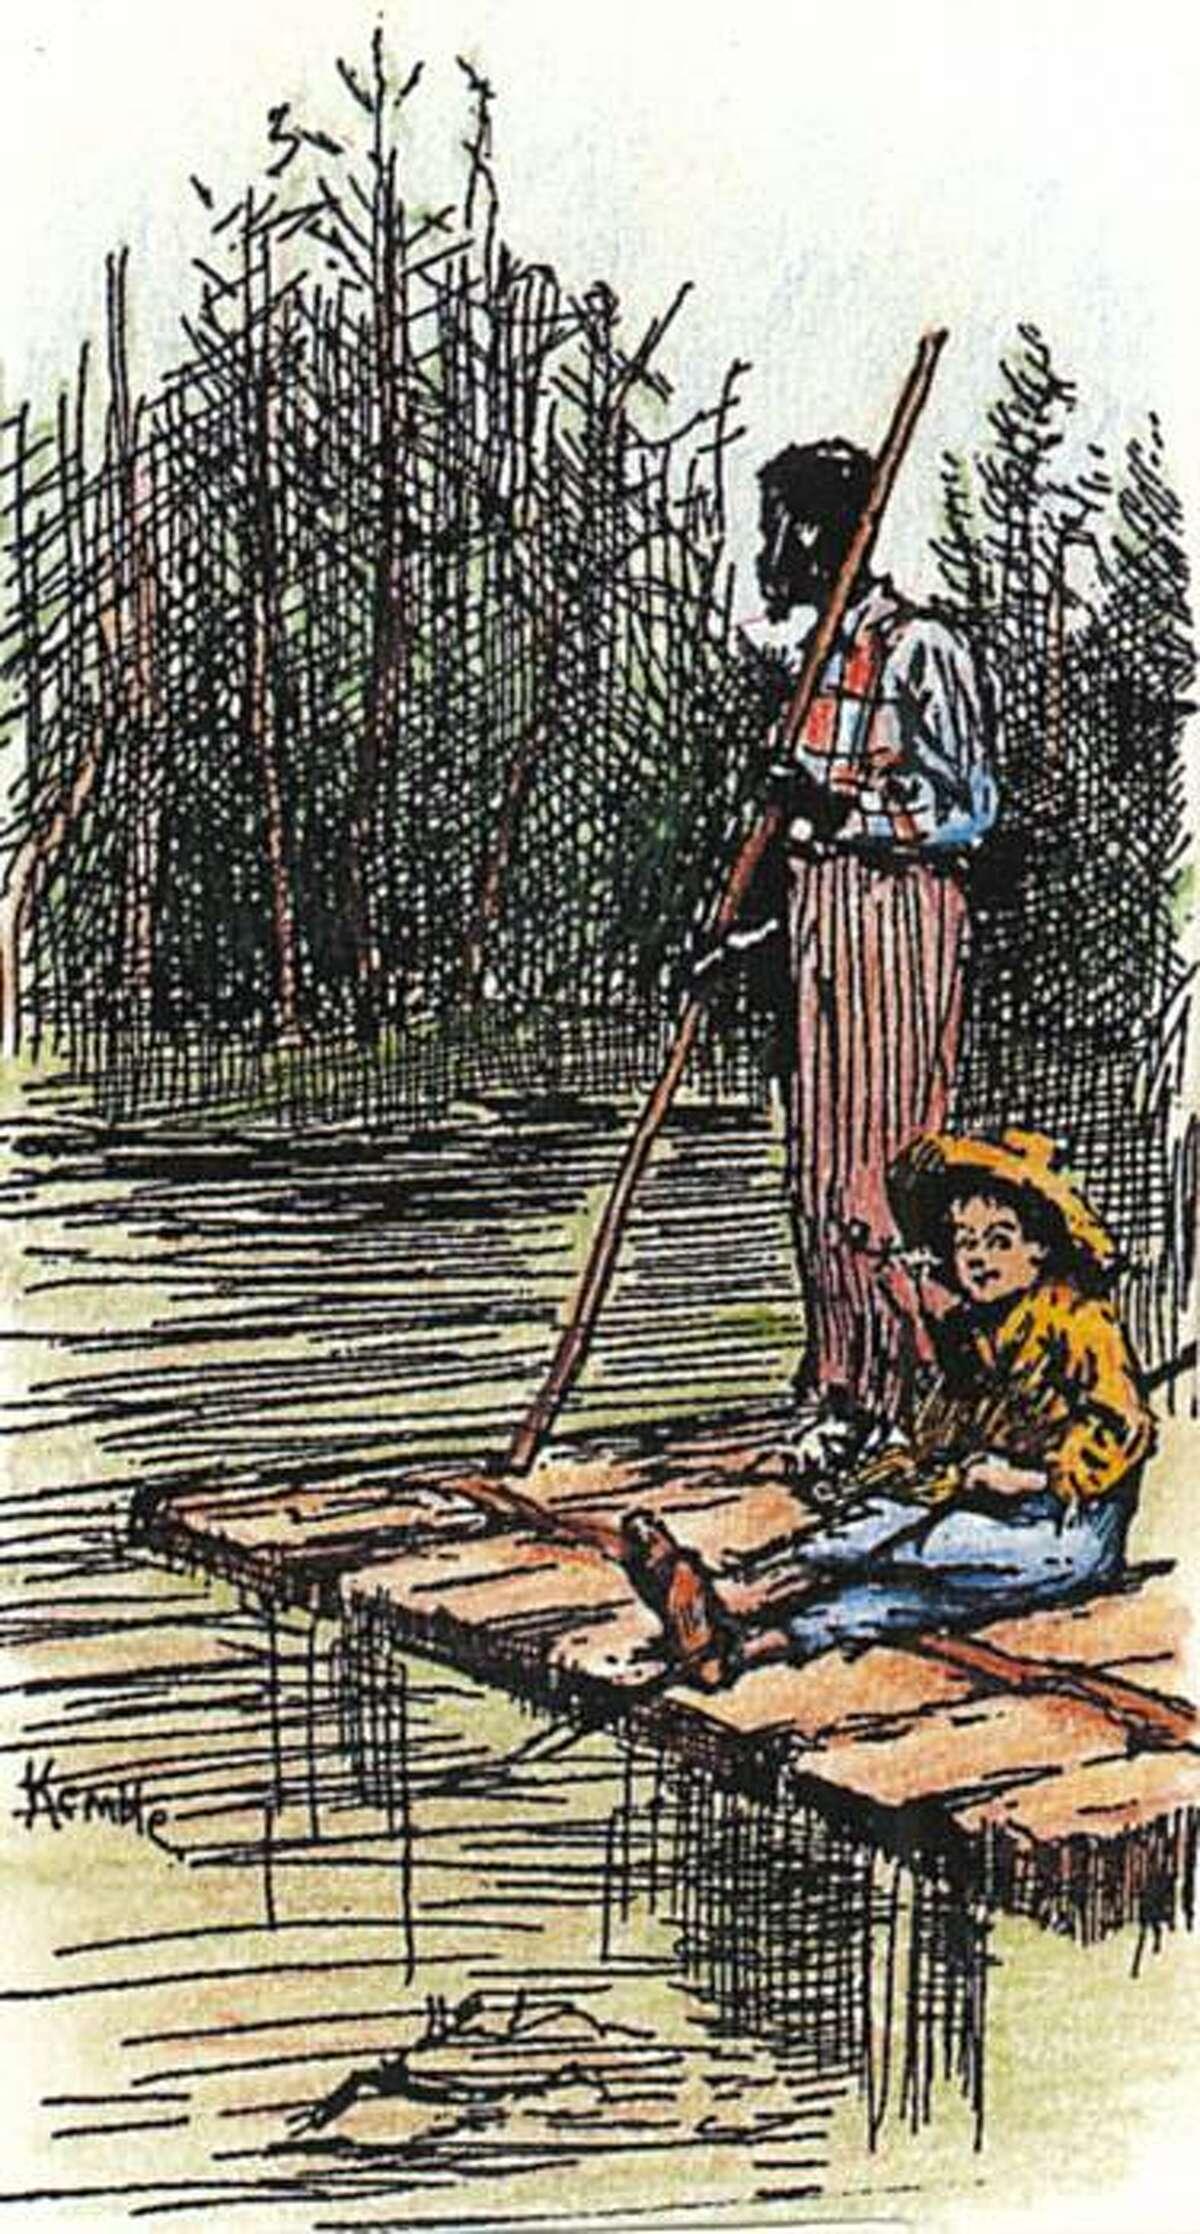 Illustration from original edition of